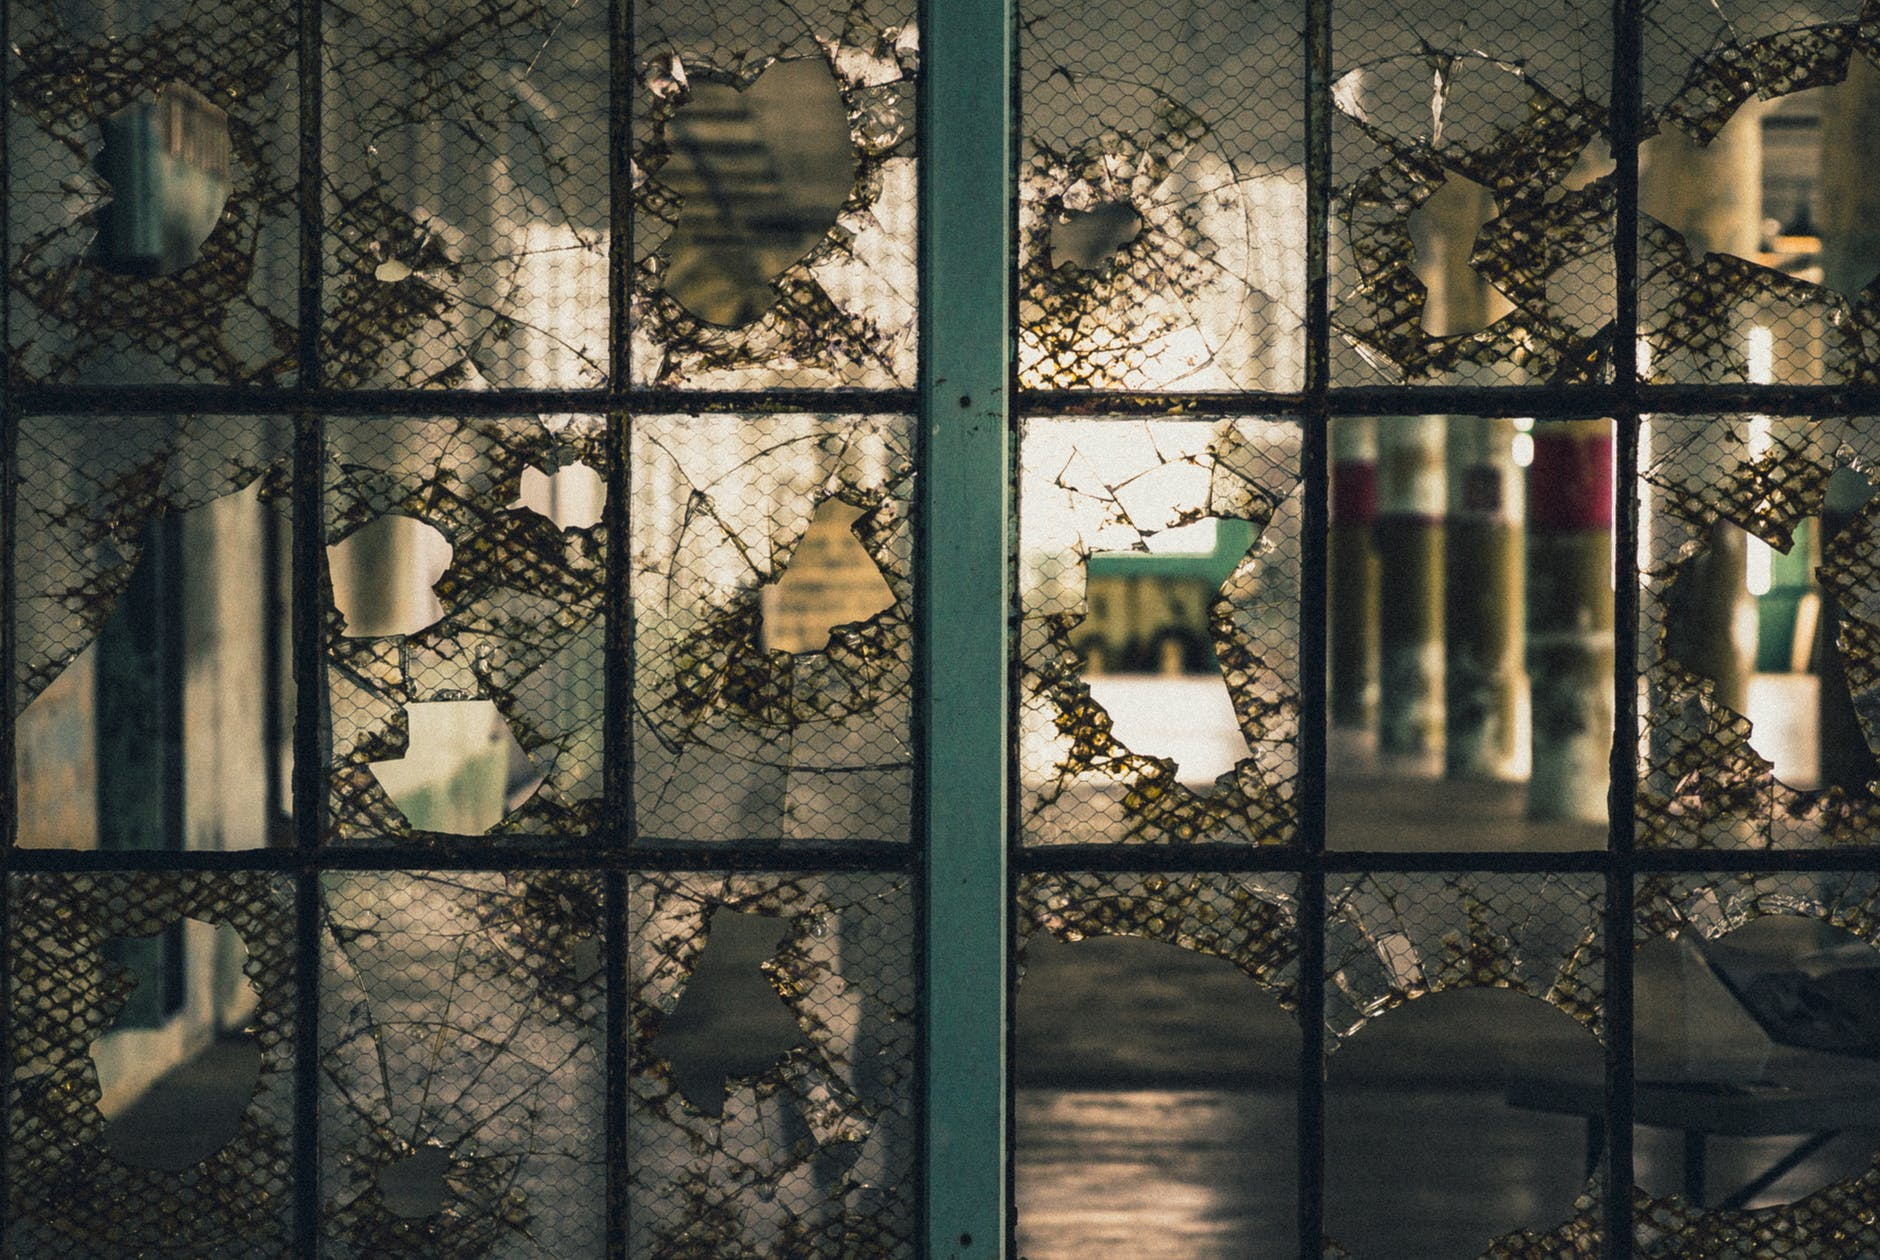 broken glass window with gray metal frame